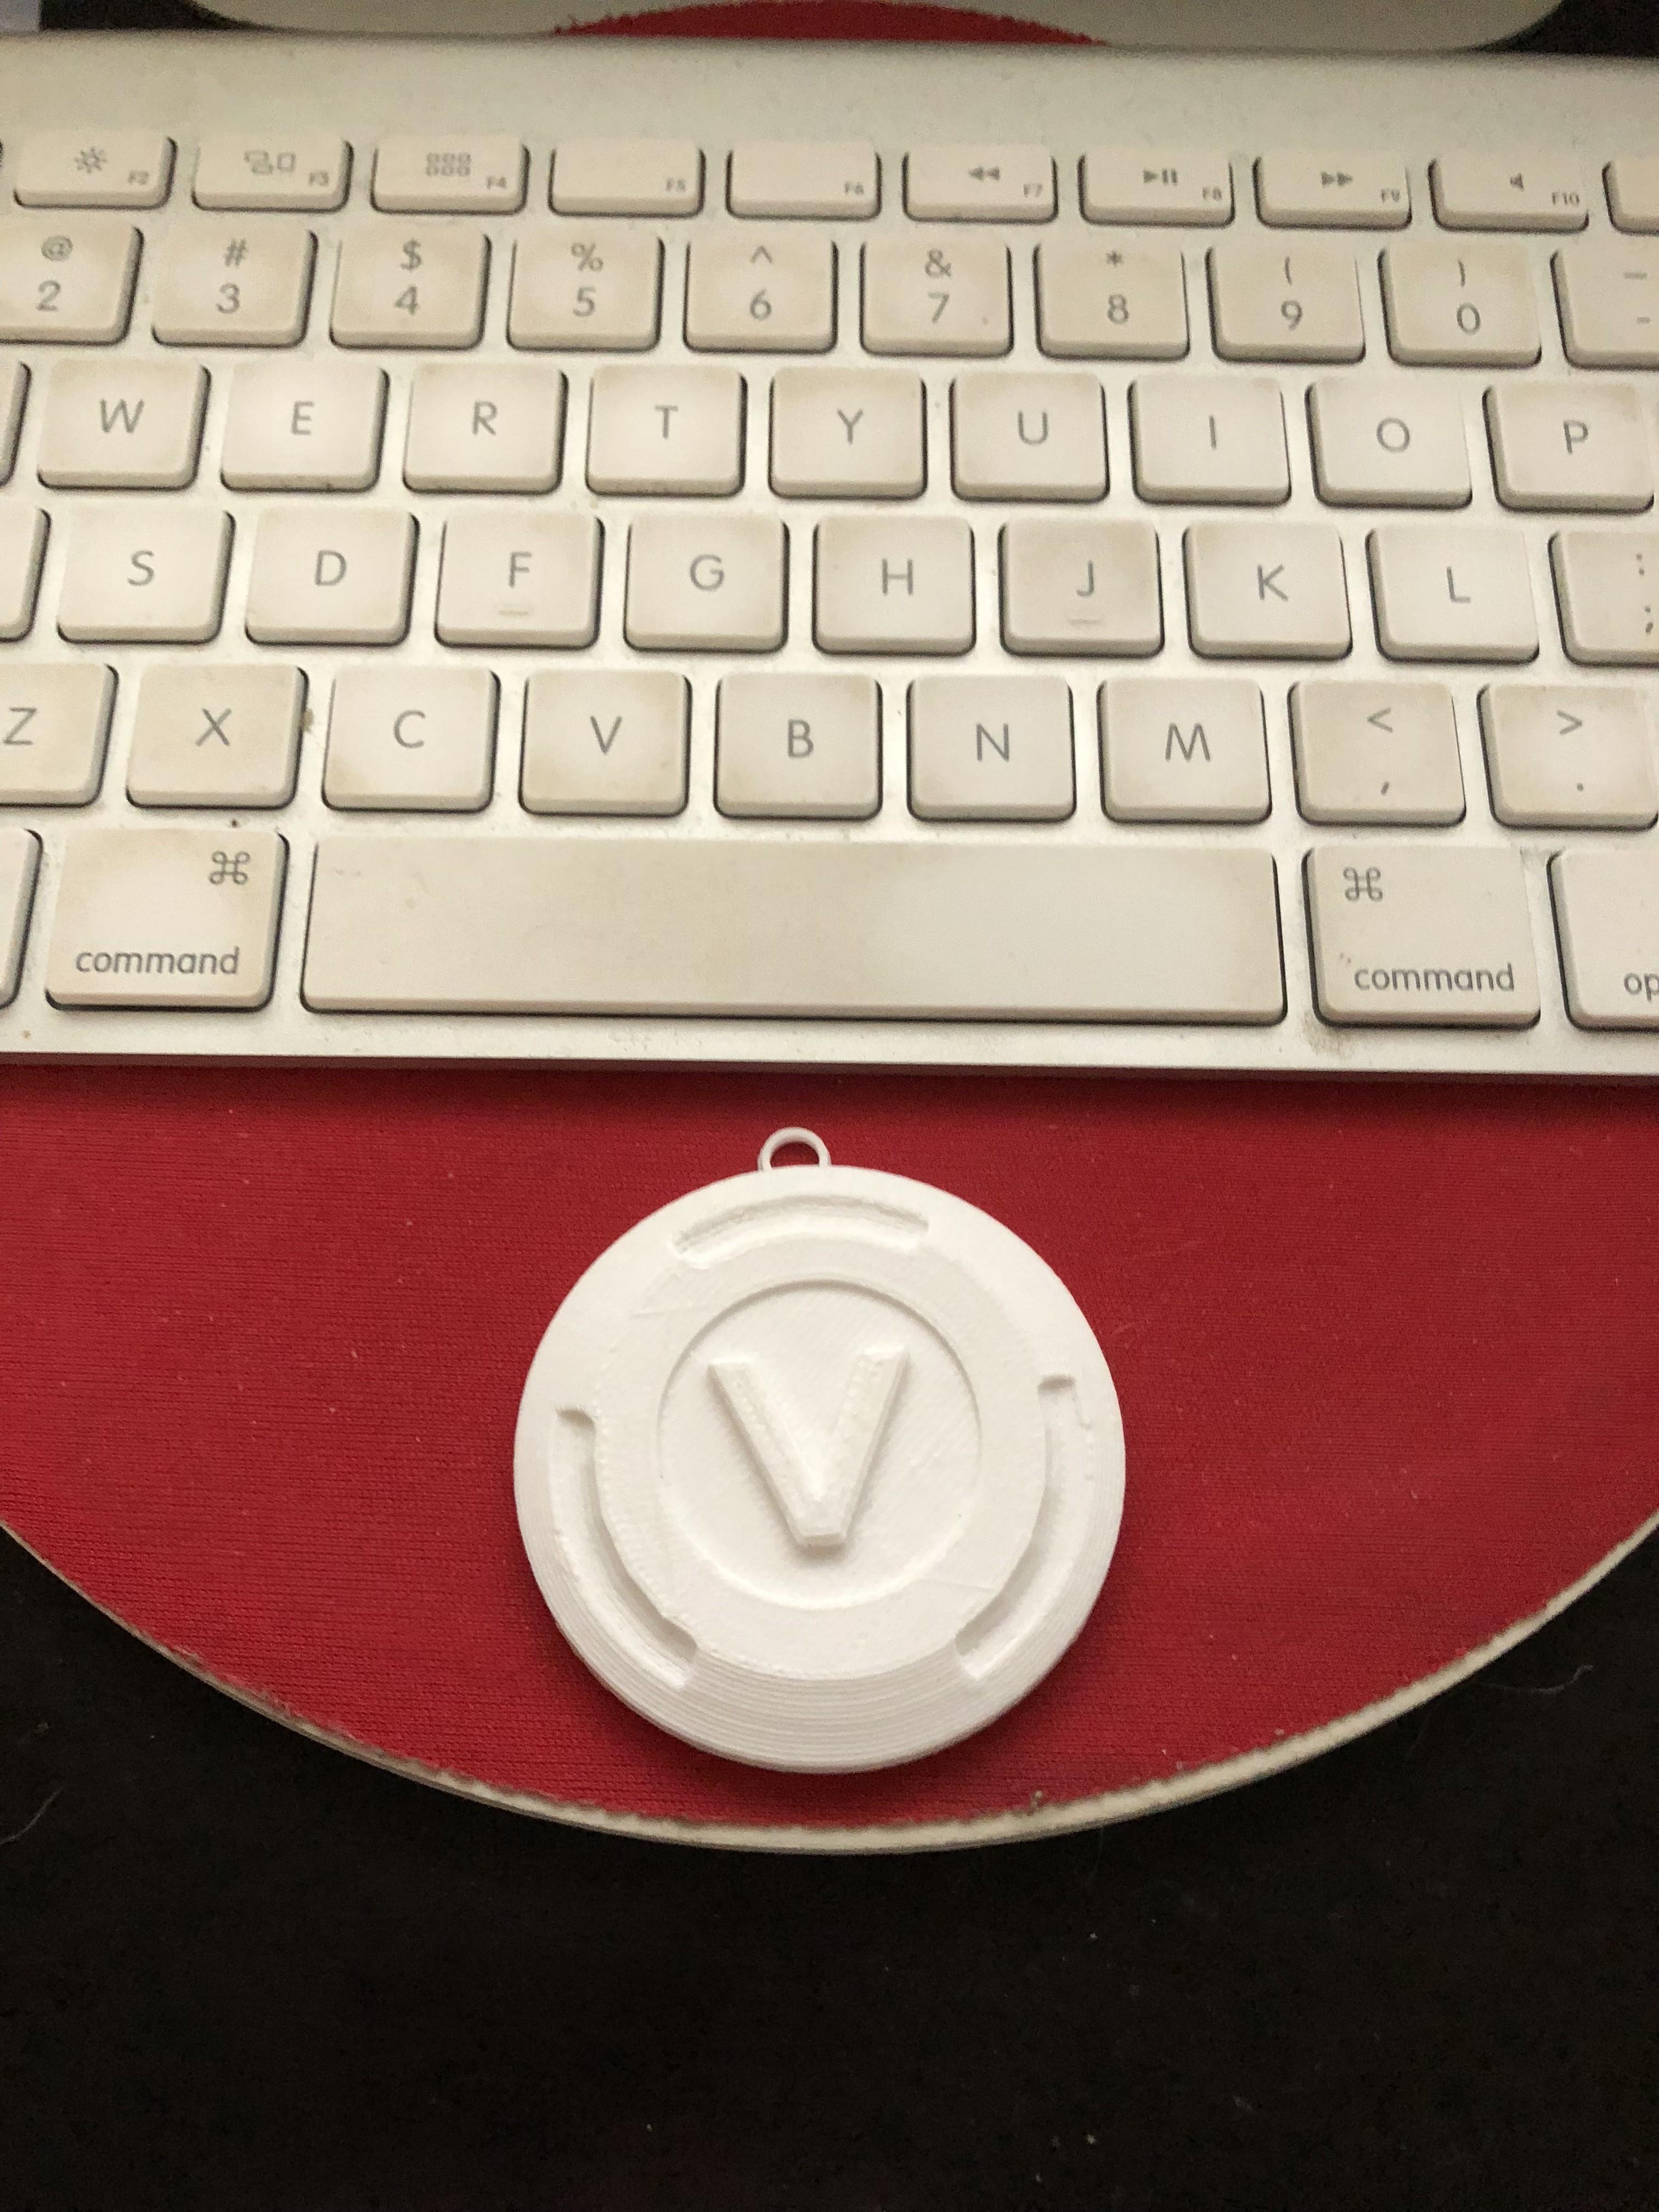 IMG_0410.jpeg Download STL file Fortnite - Vbuck Keychain! • 3D printer object, Coorbin